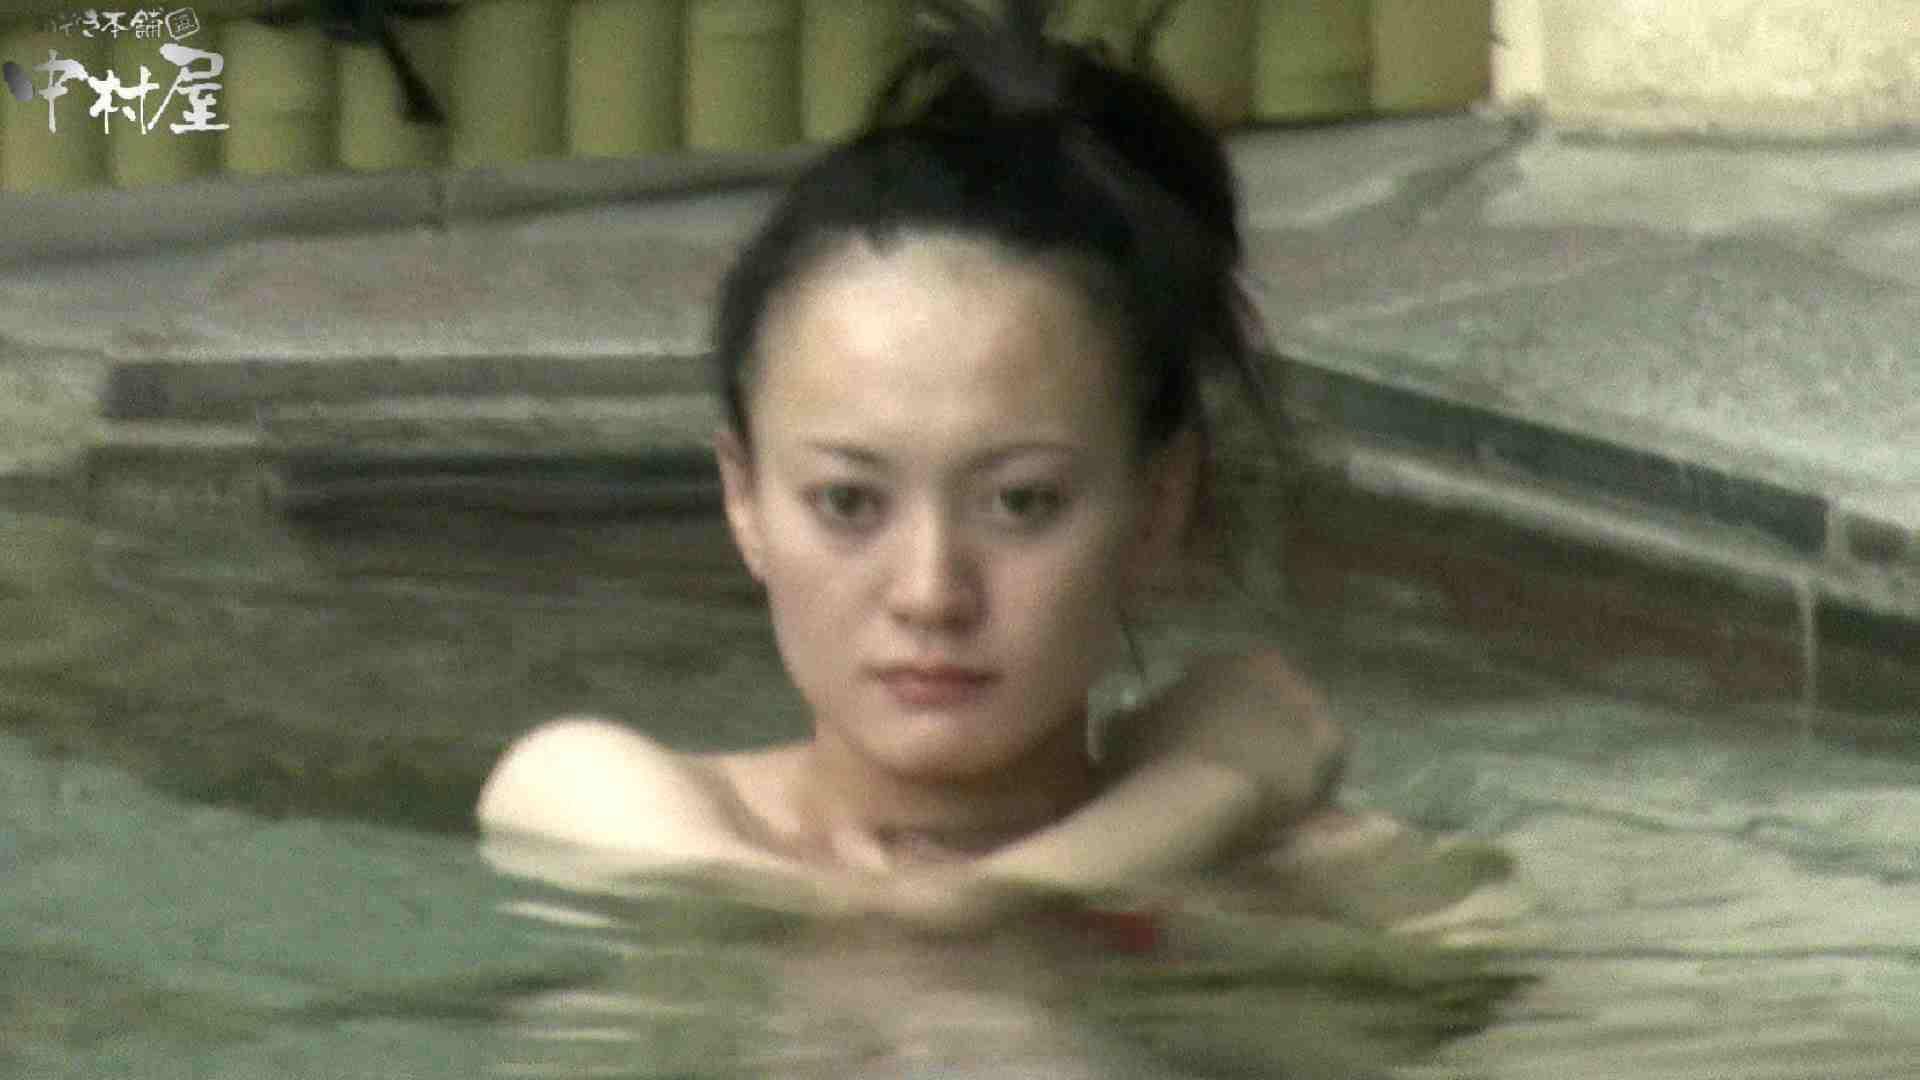 Aquaな露天風呂Vol.900 盗撮シリーズ | 露天風呂編  110PIX 5